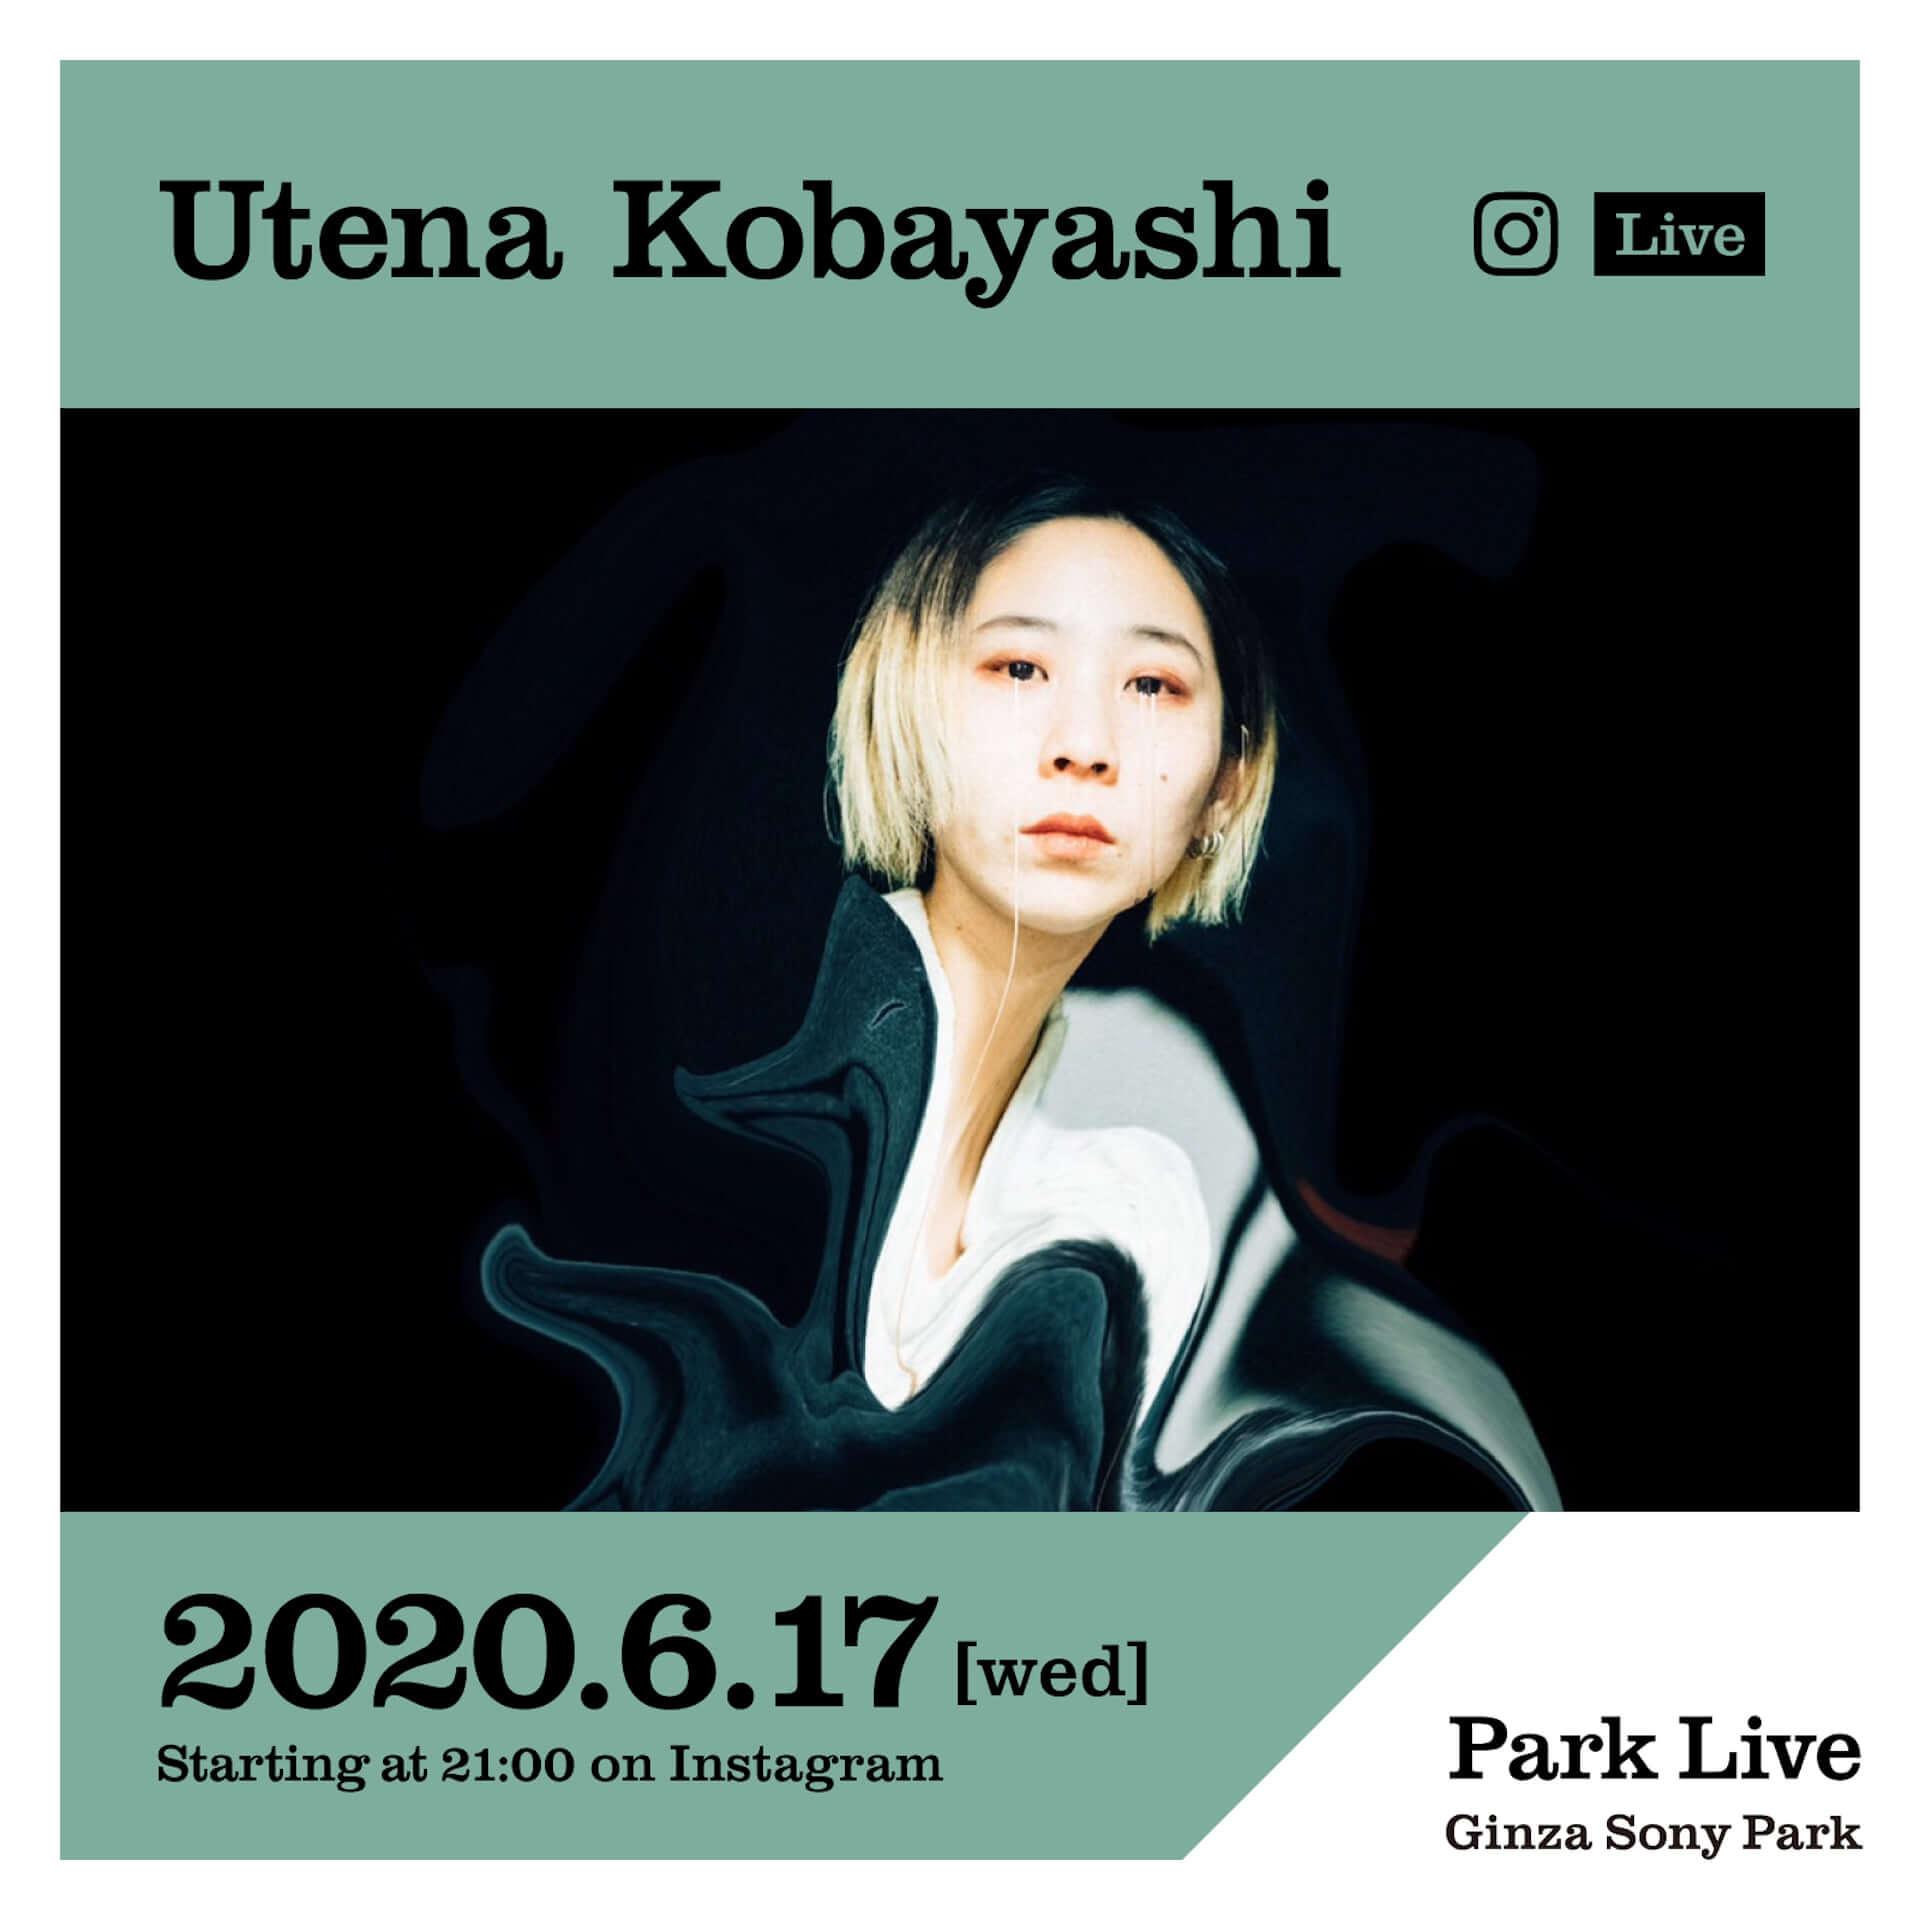 KID FRESINOのバンドセットにも参加する小林うてながGinza Sony Parkの配信ライブ<Park Live>に出演決定! music200615_ginzasonypark_utena_k_1-1920x1920